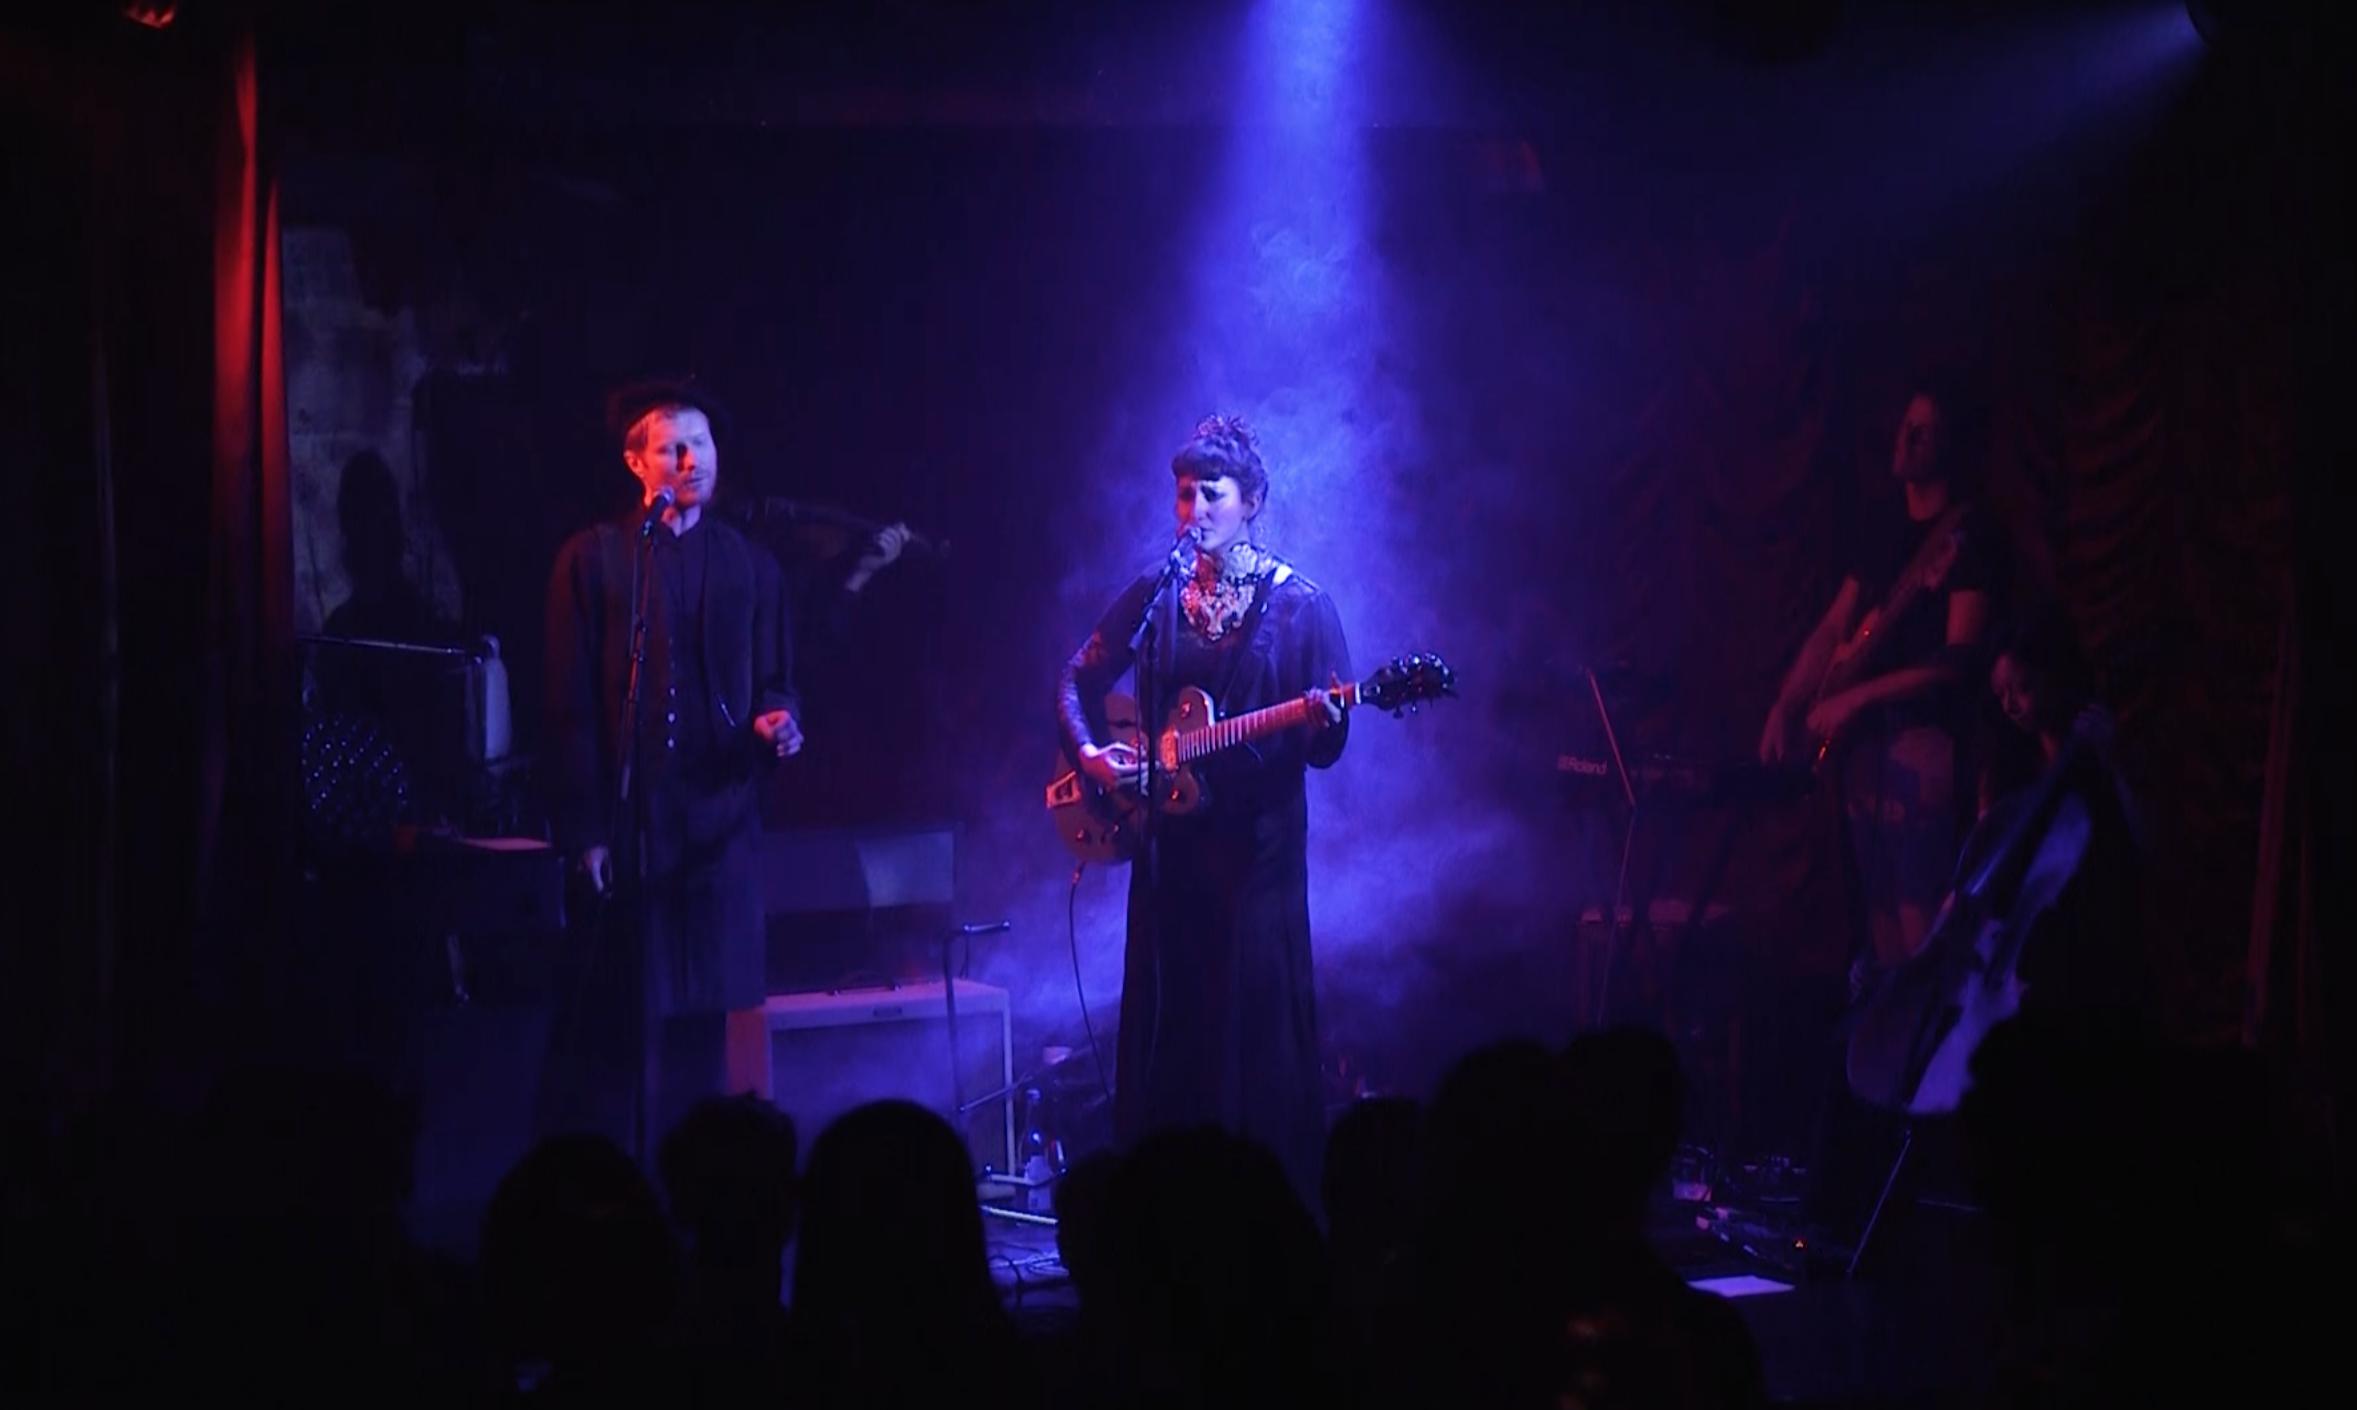 Photo Credit Joshua Donaldson, Evelyn Drach live at The Box, London, Soho